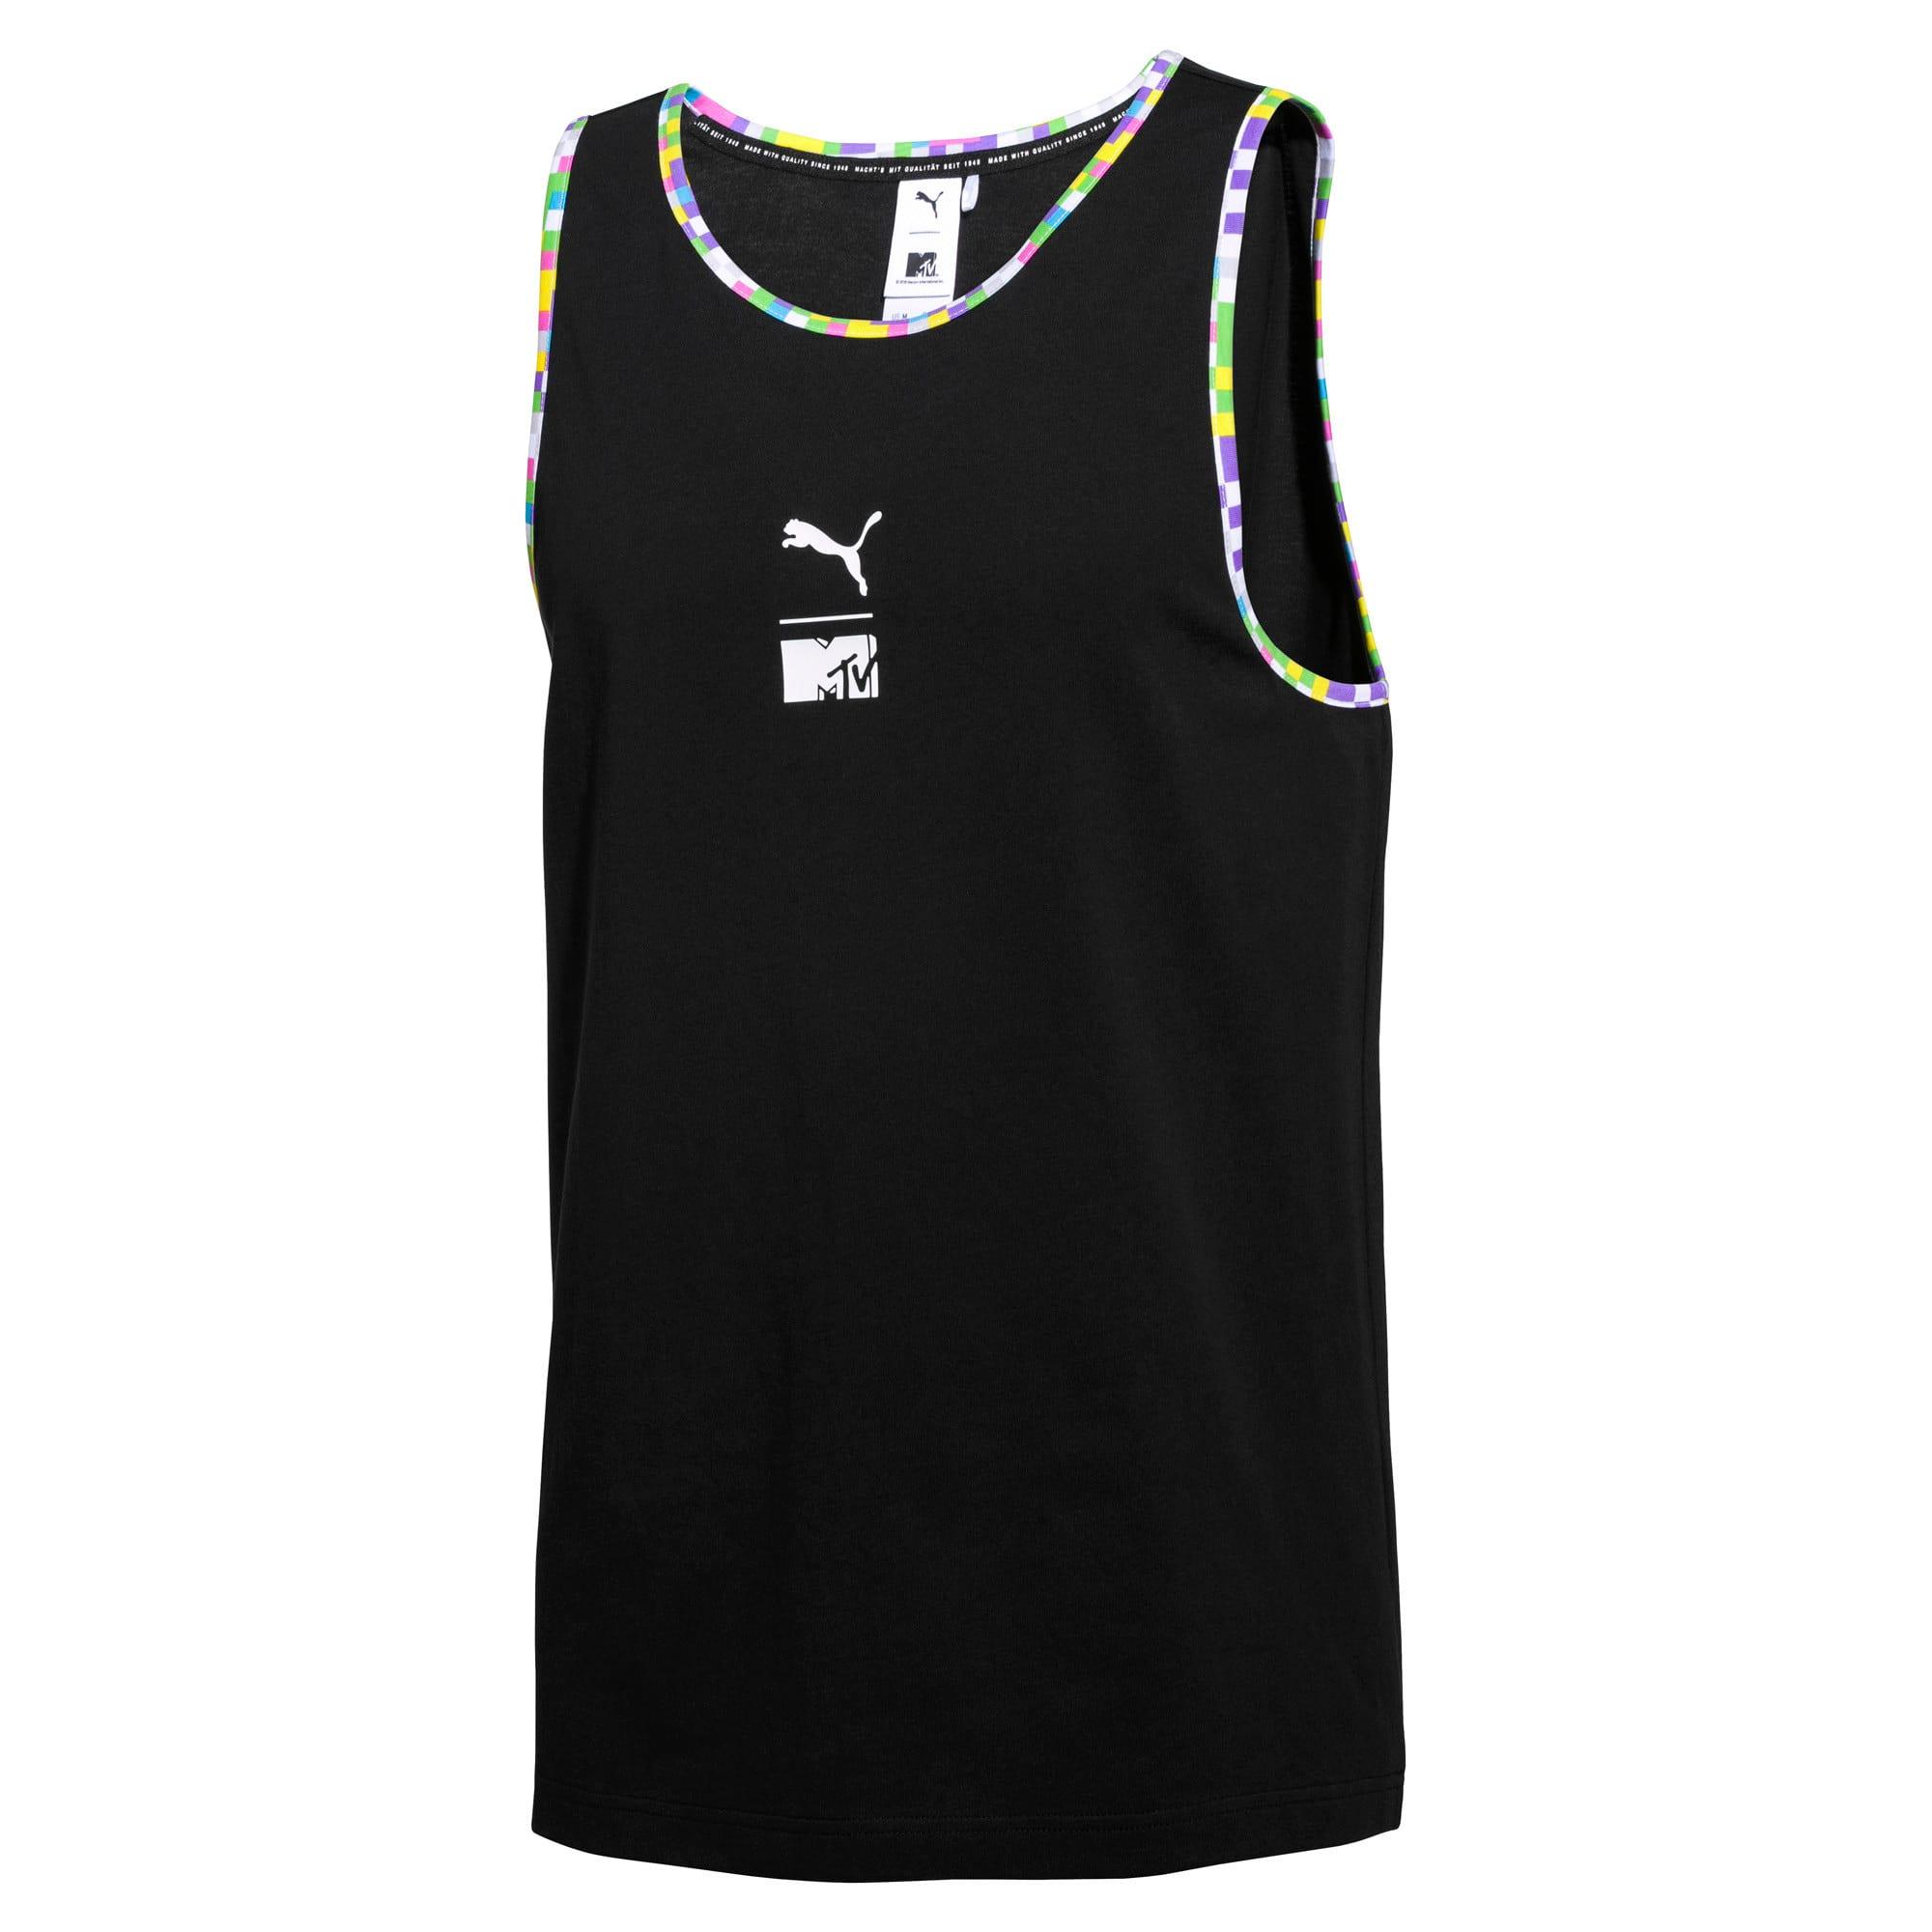 Miniatura 1 de Camiseta sin mangas PUMA x MTV para hombre, Puma Black, mediano